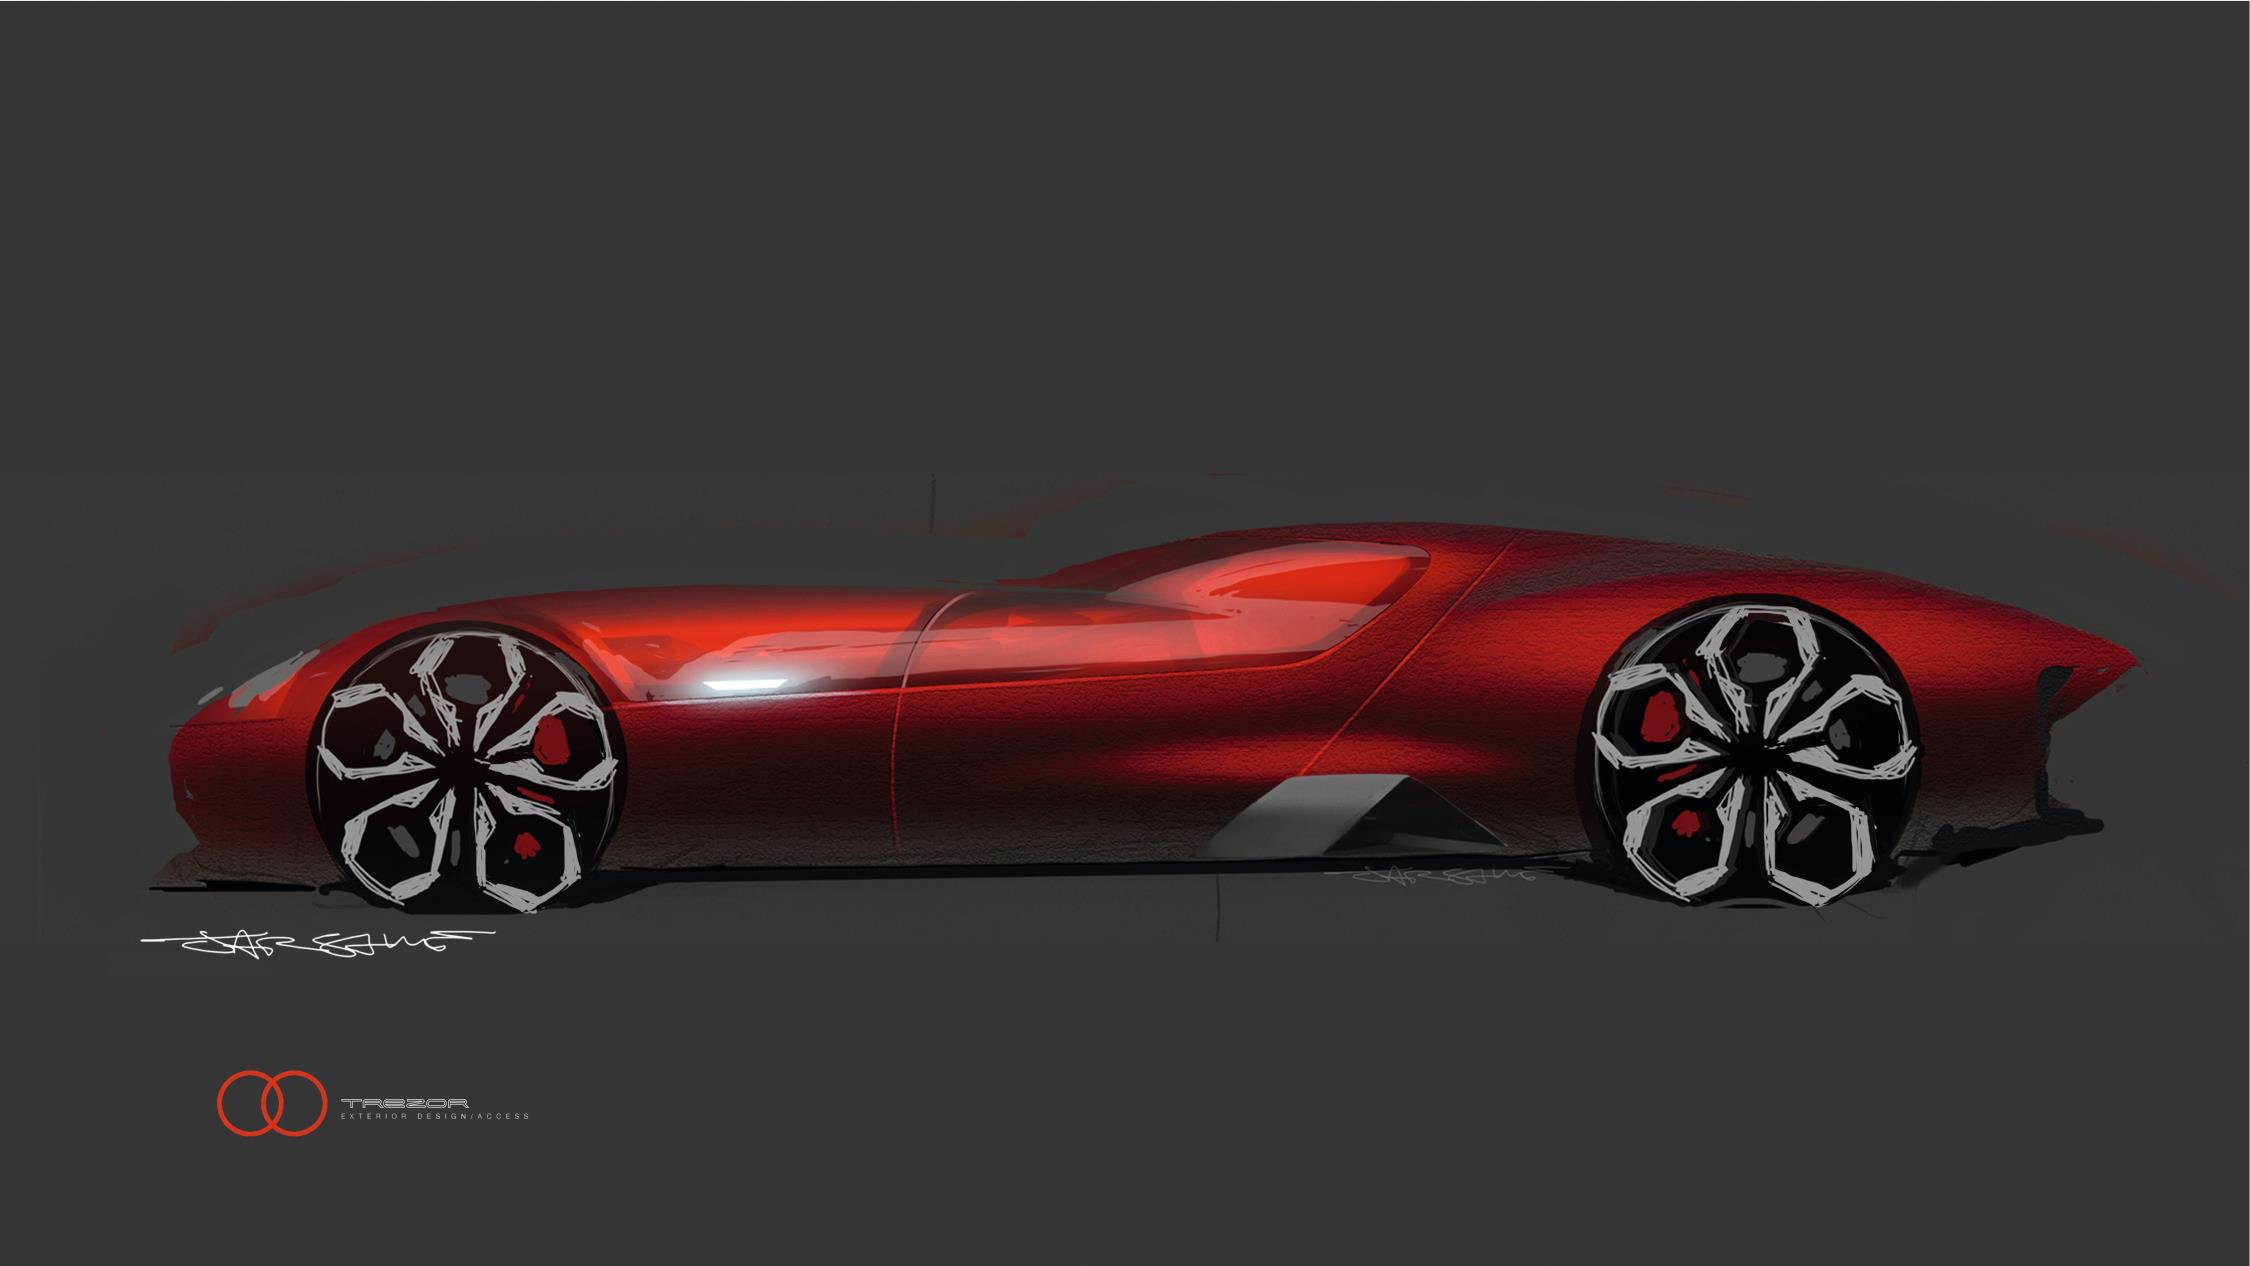 Trezor Concept Design - EMBARGO 08h15 UK Time 290916 (5).JPG